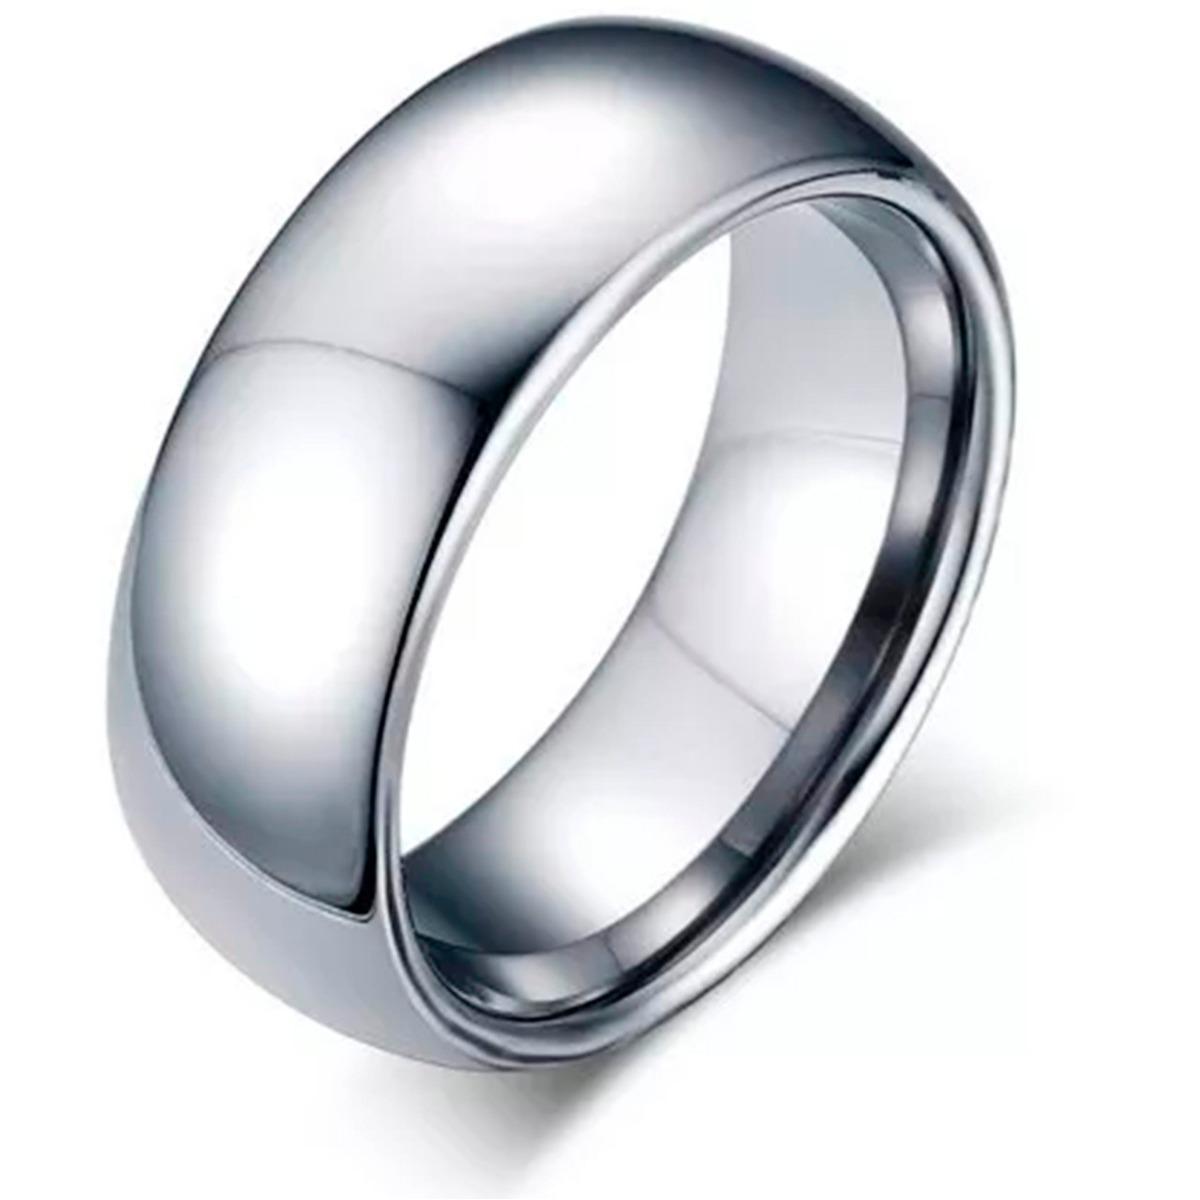 0a6432af481 anel aliança aço inox prata 8mm compromisso namoro anatômica. Carregando  zoom.